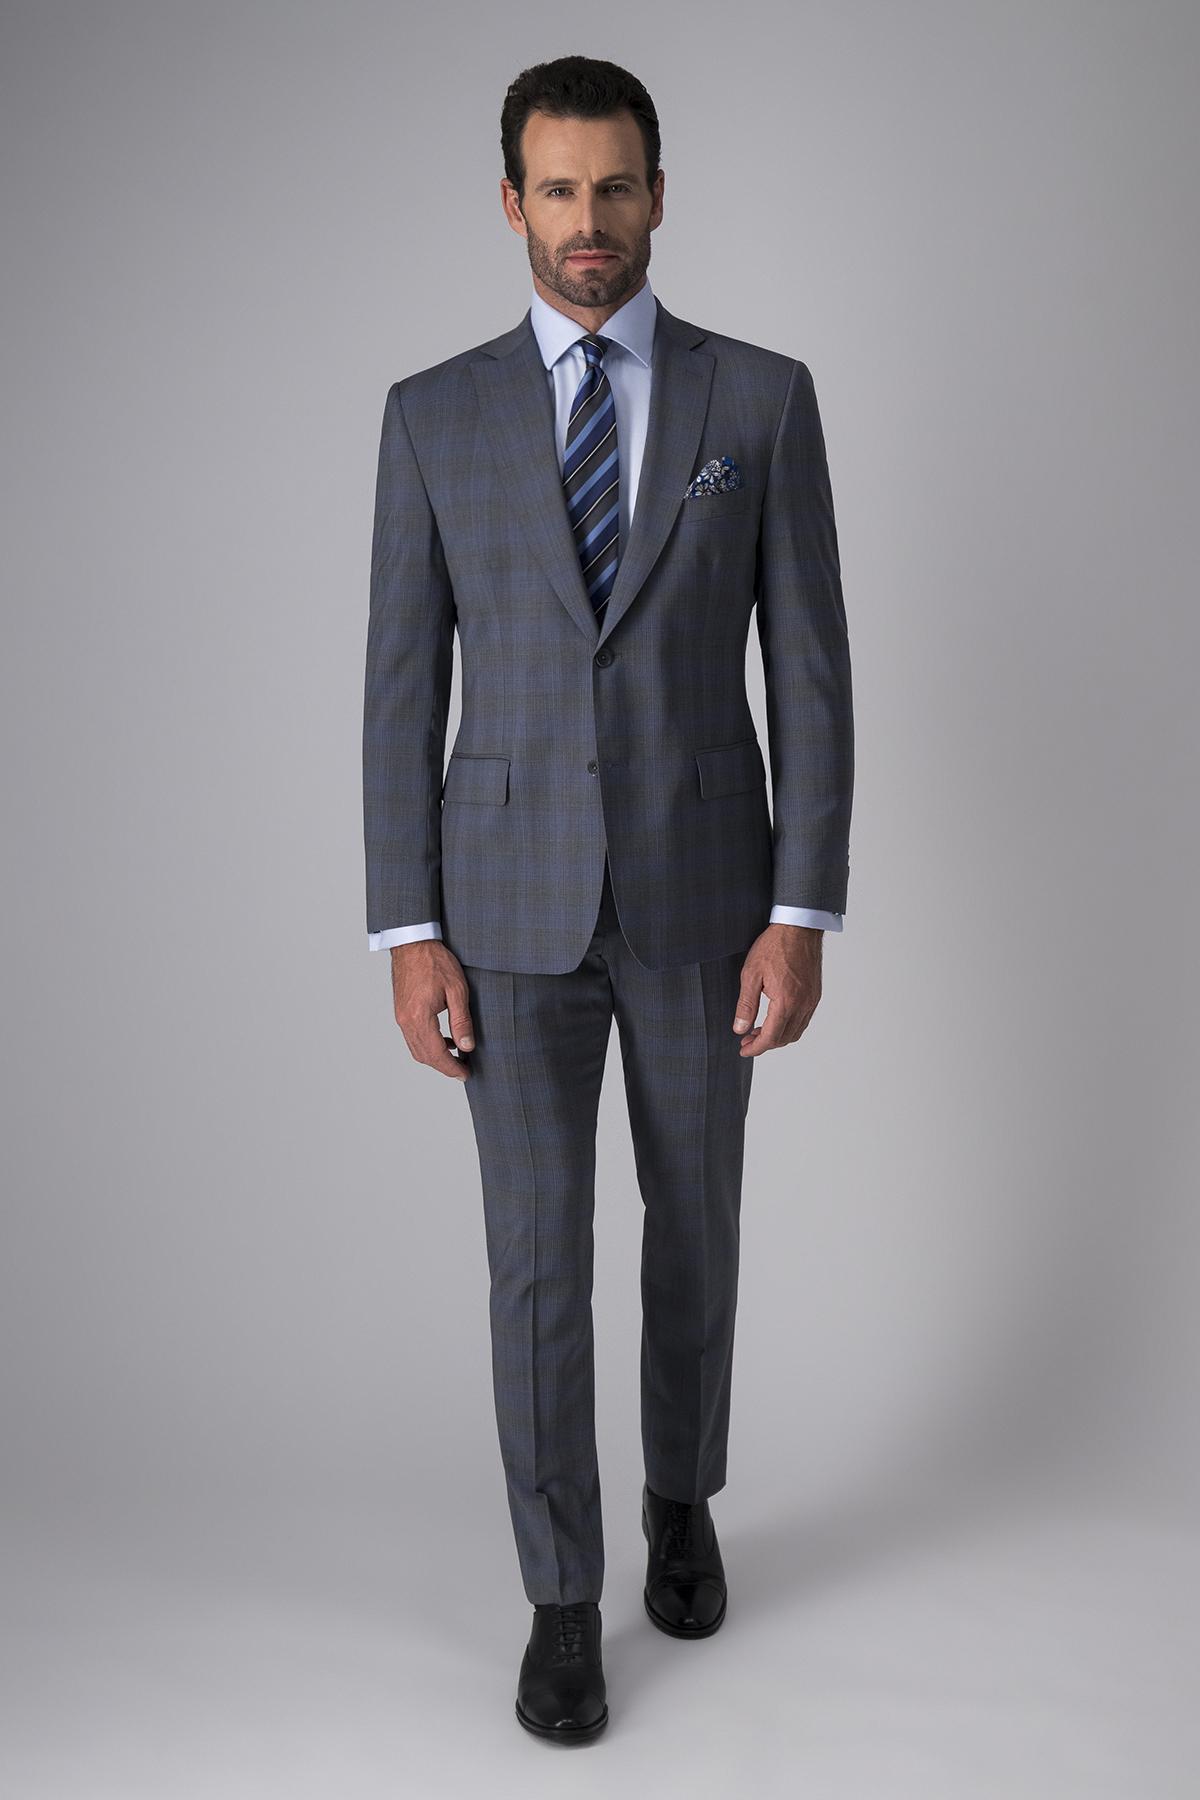 Traje Calderoni, tela italiana,  slim fit, fantasía gris.